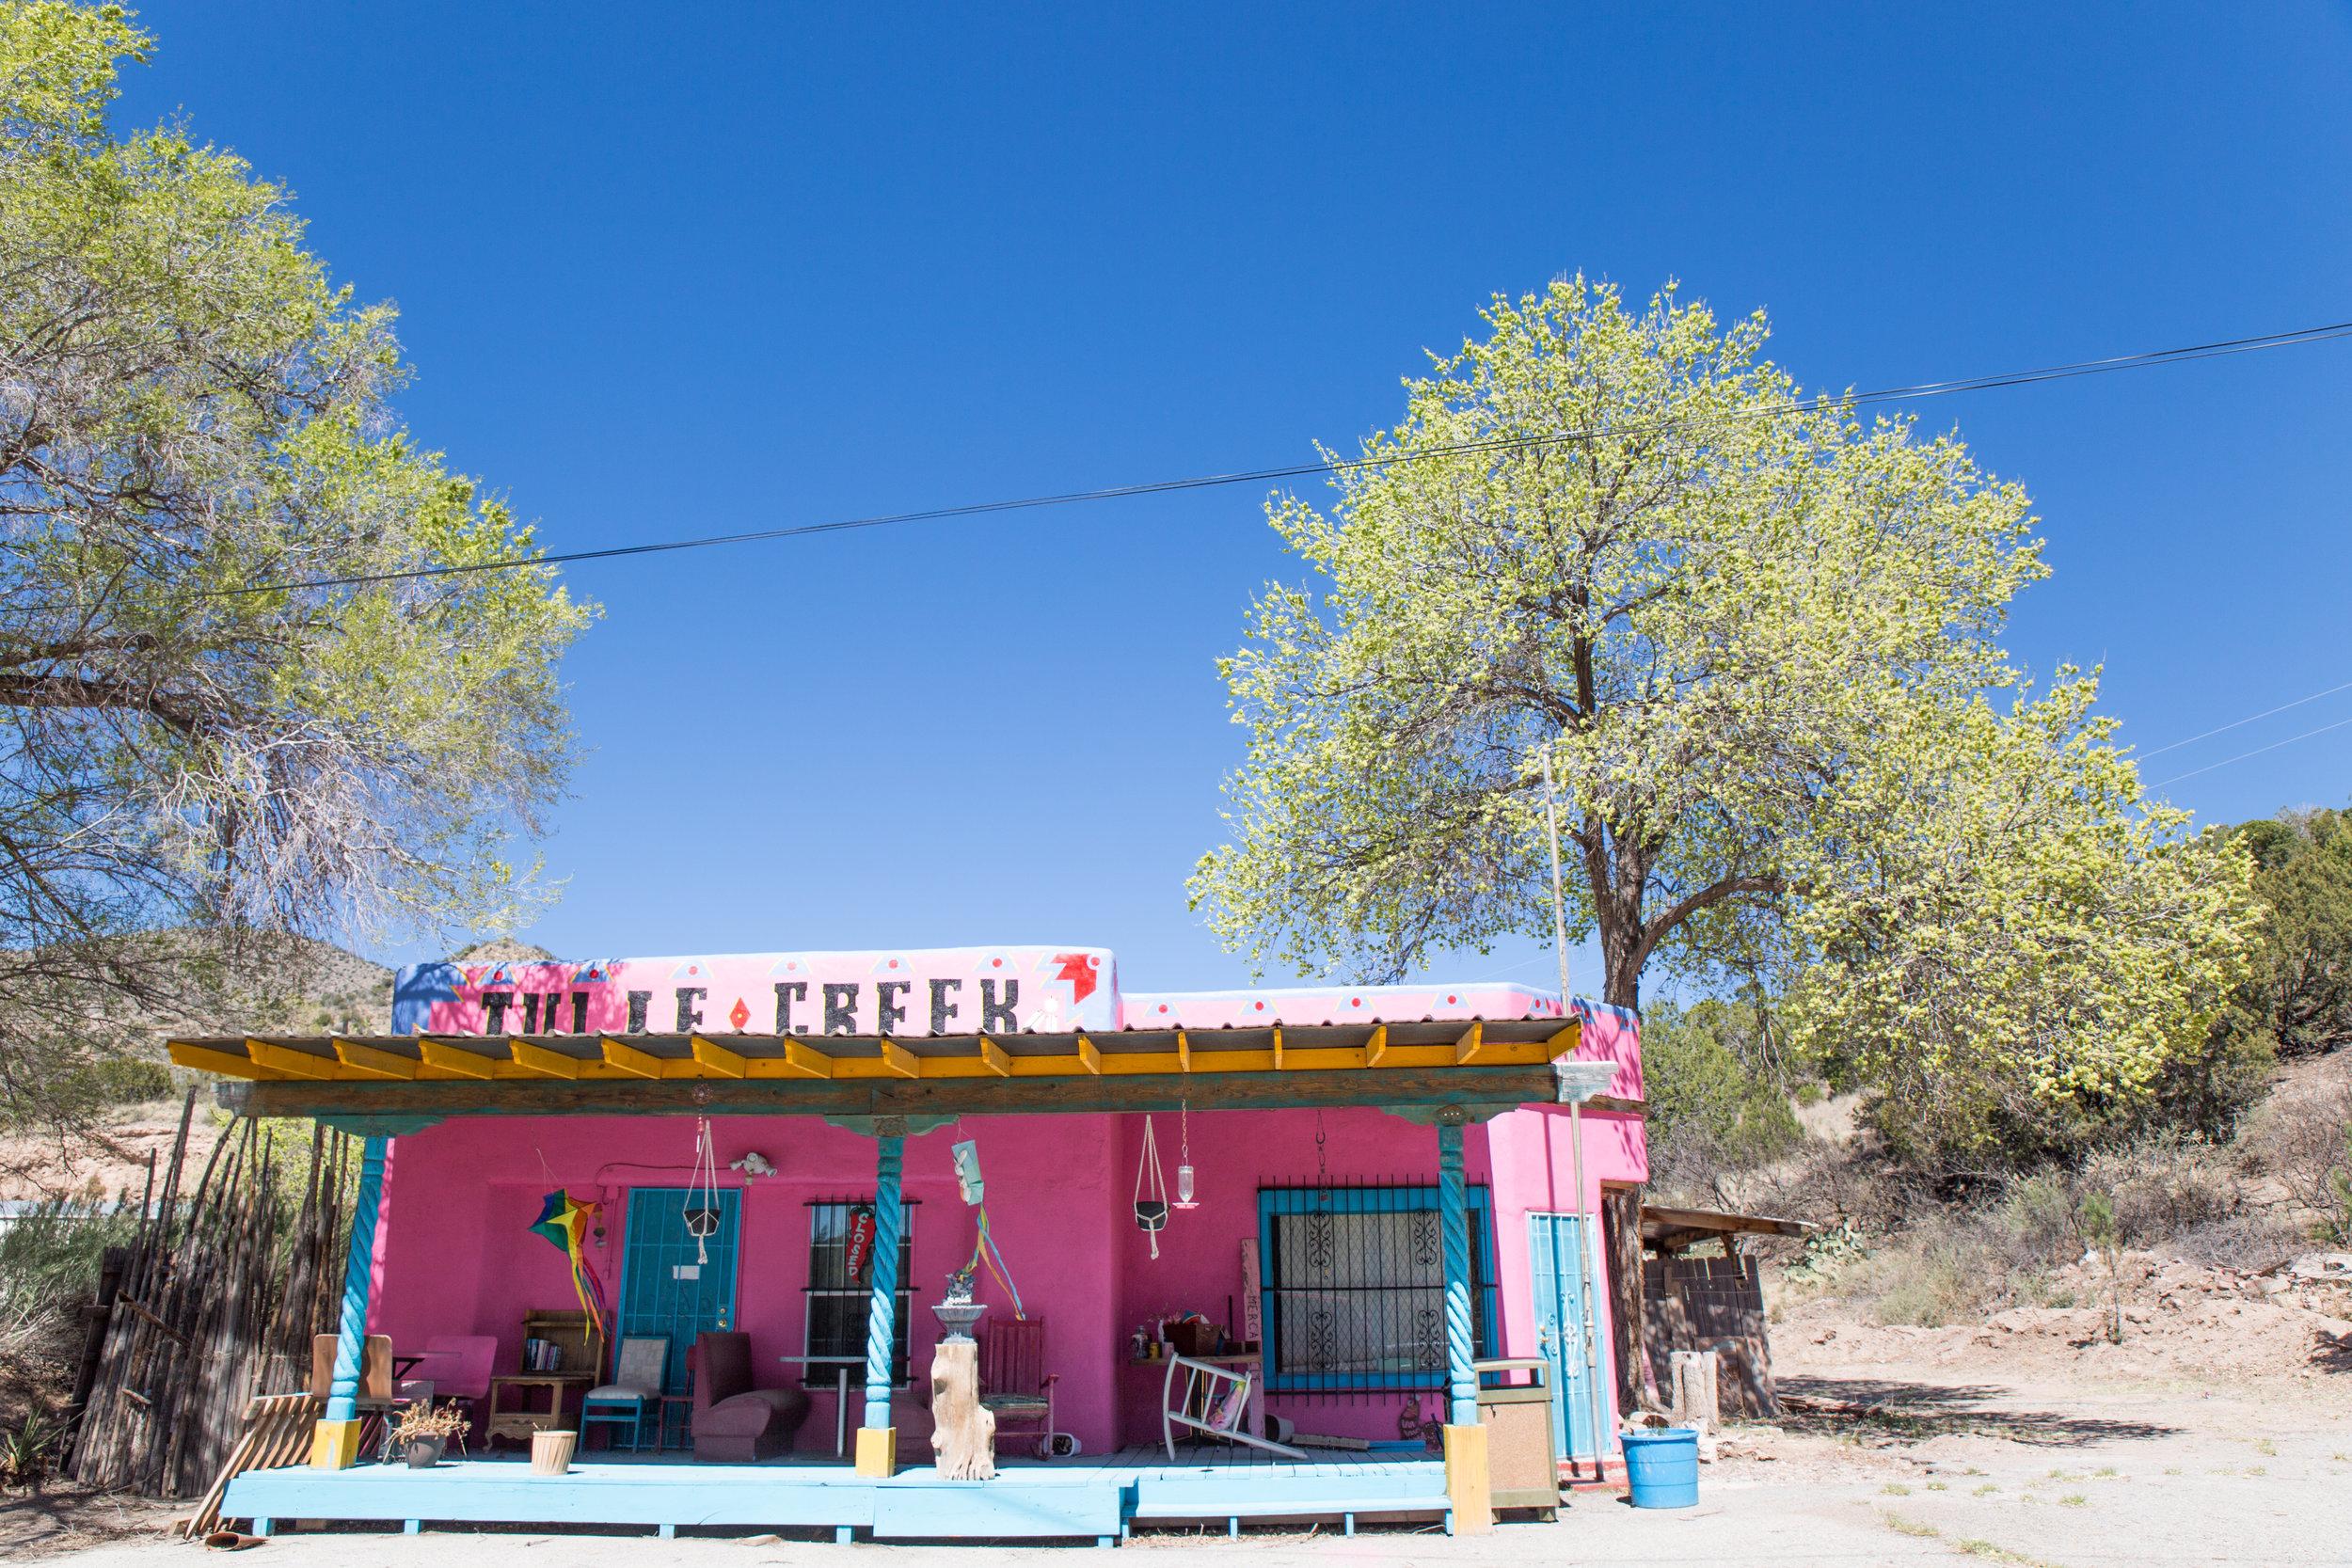 Cute store on the road near Tularosa